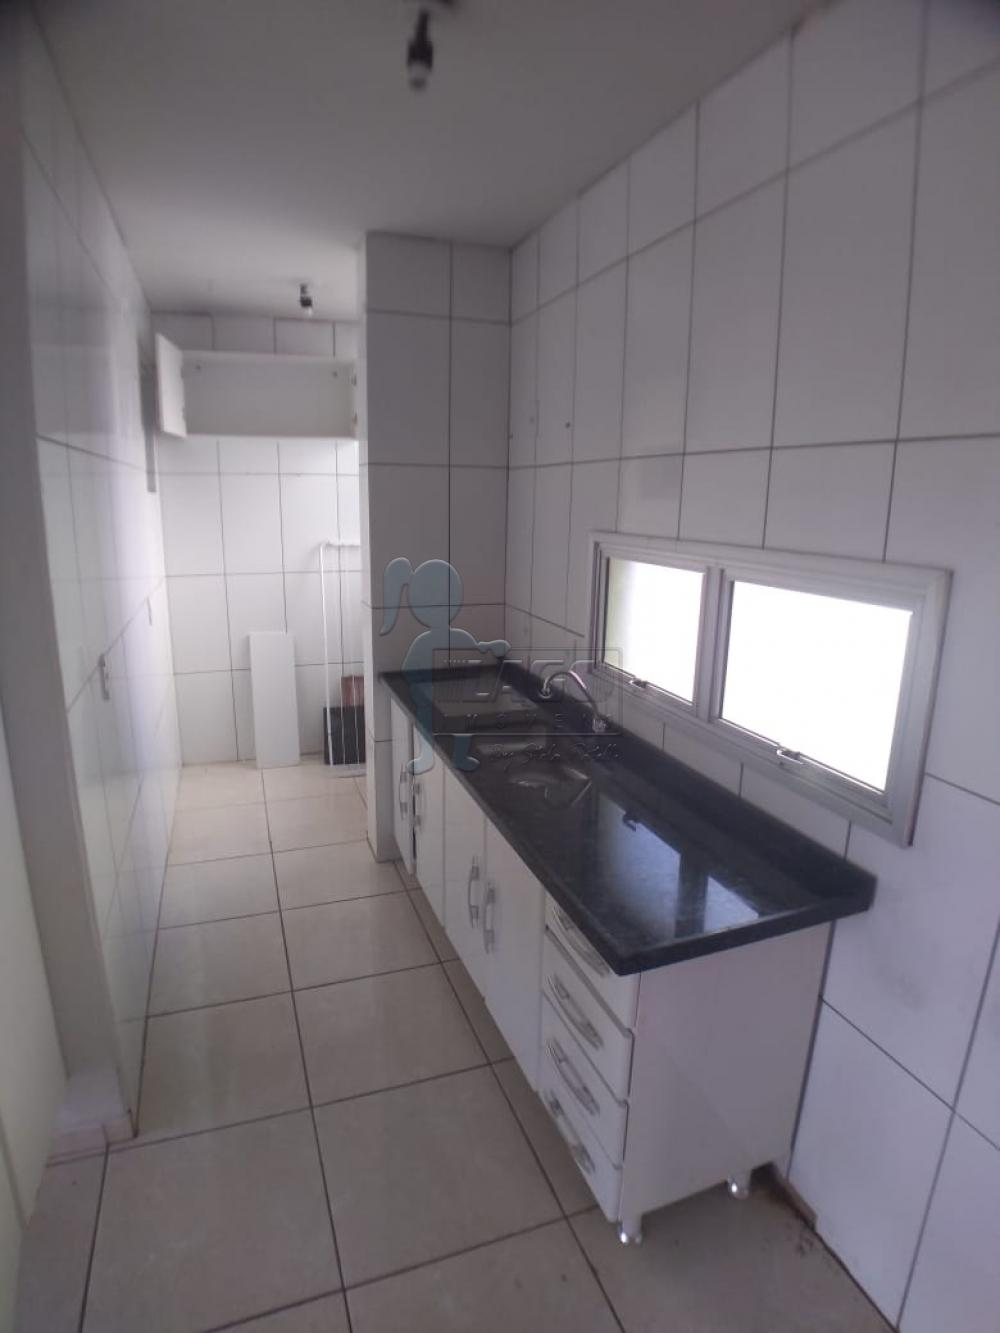 Ribeirao Preto Apartamento Locacao R$ 1.100,00 2 Dormitorios 1 Suite Area do terreno 58.92m2 Area construida 63.53m2